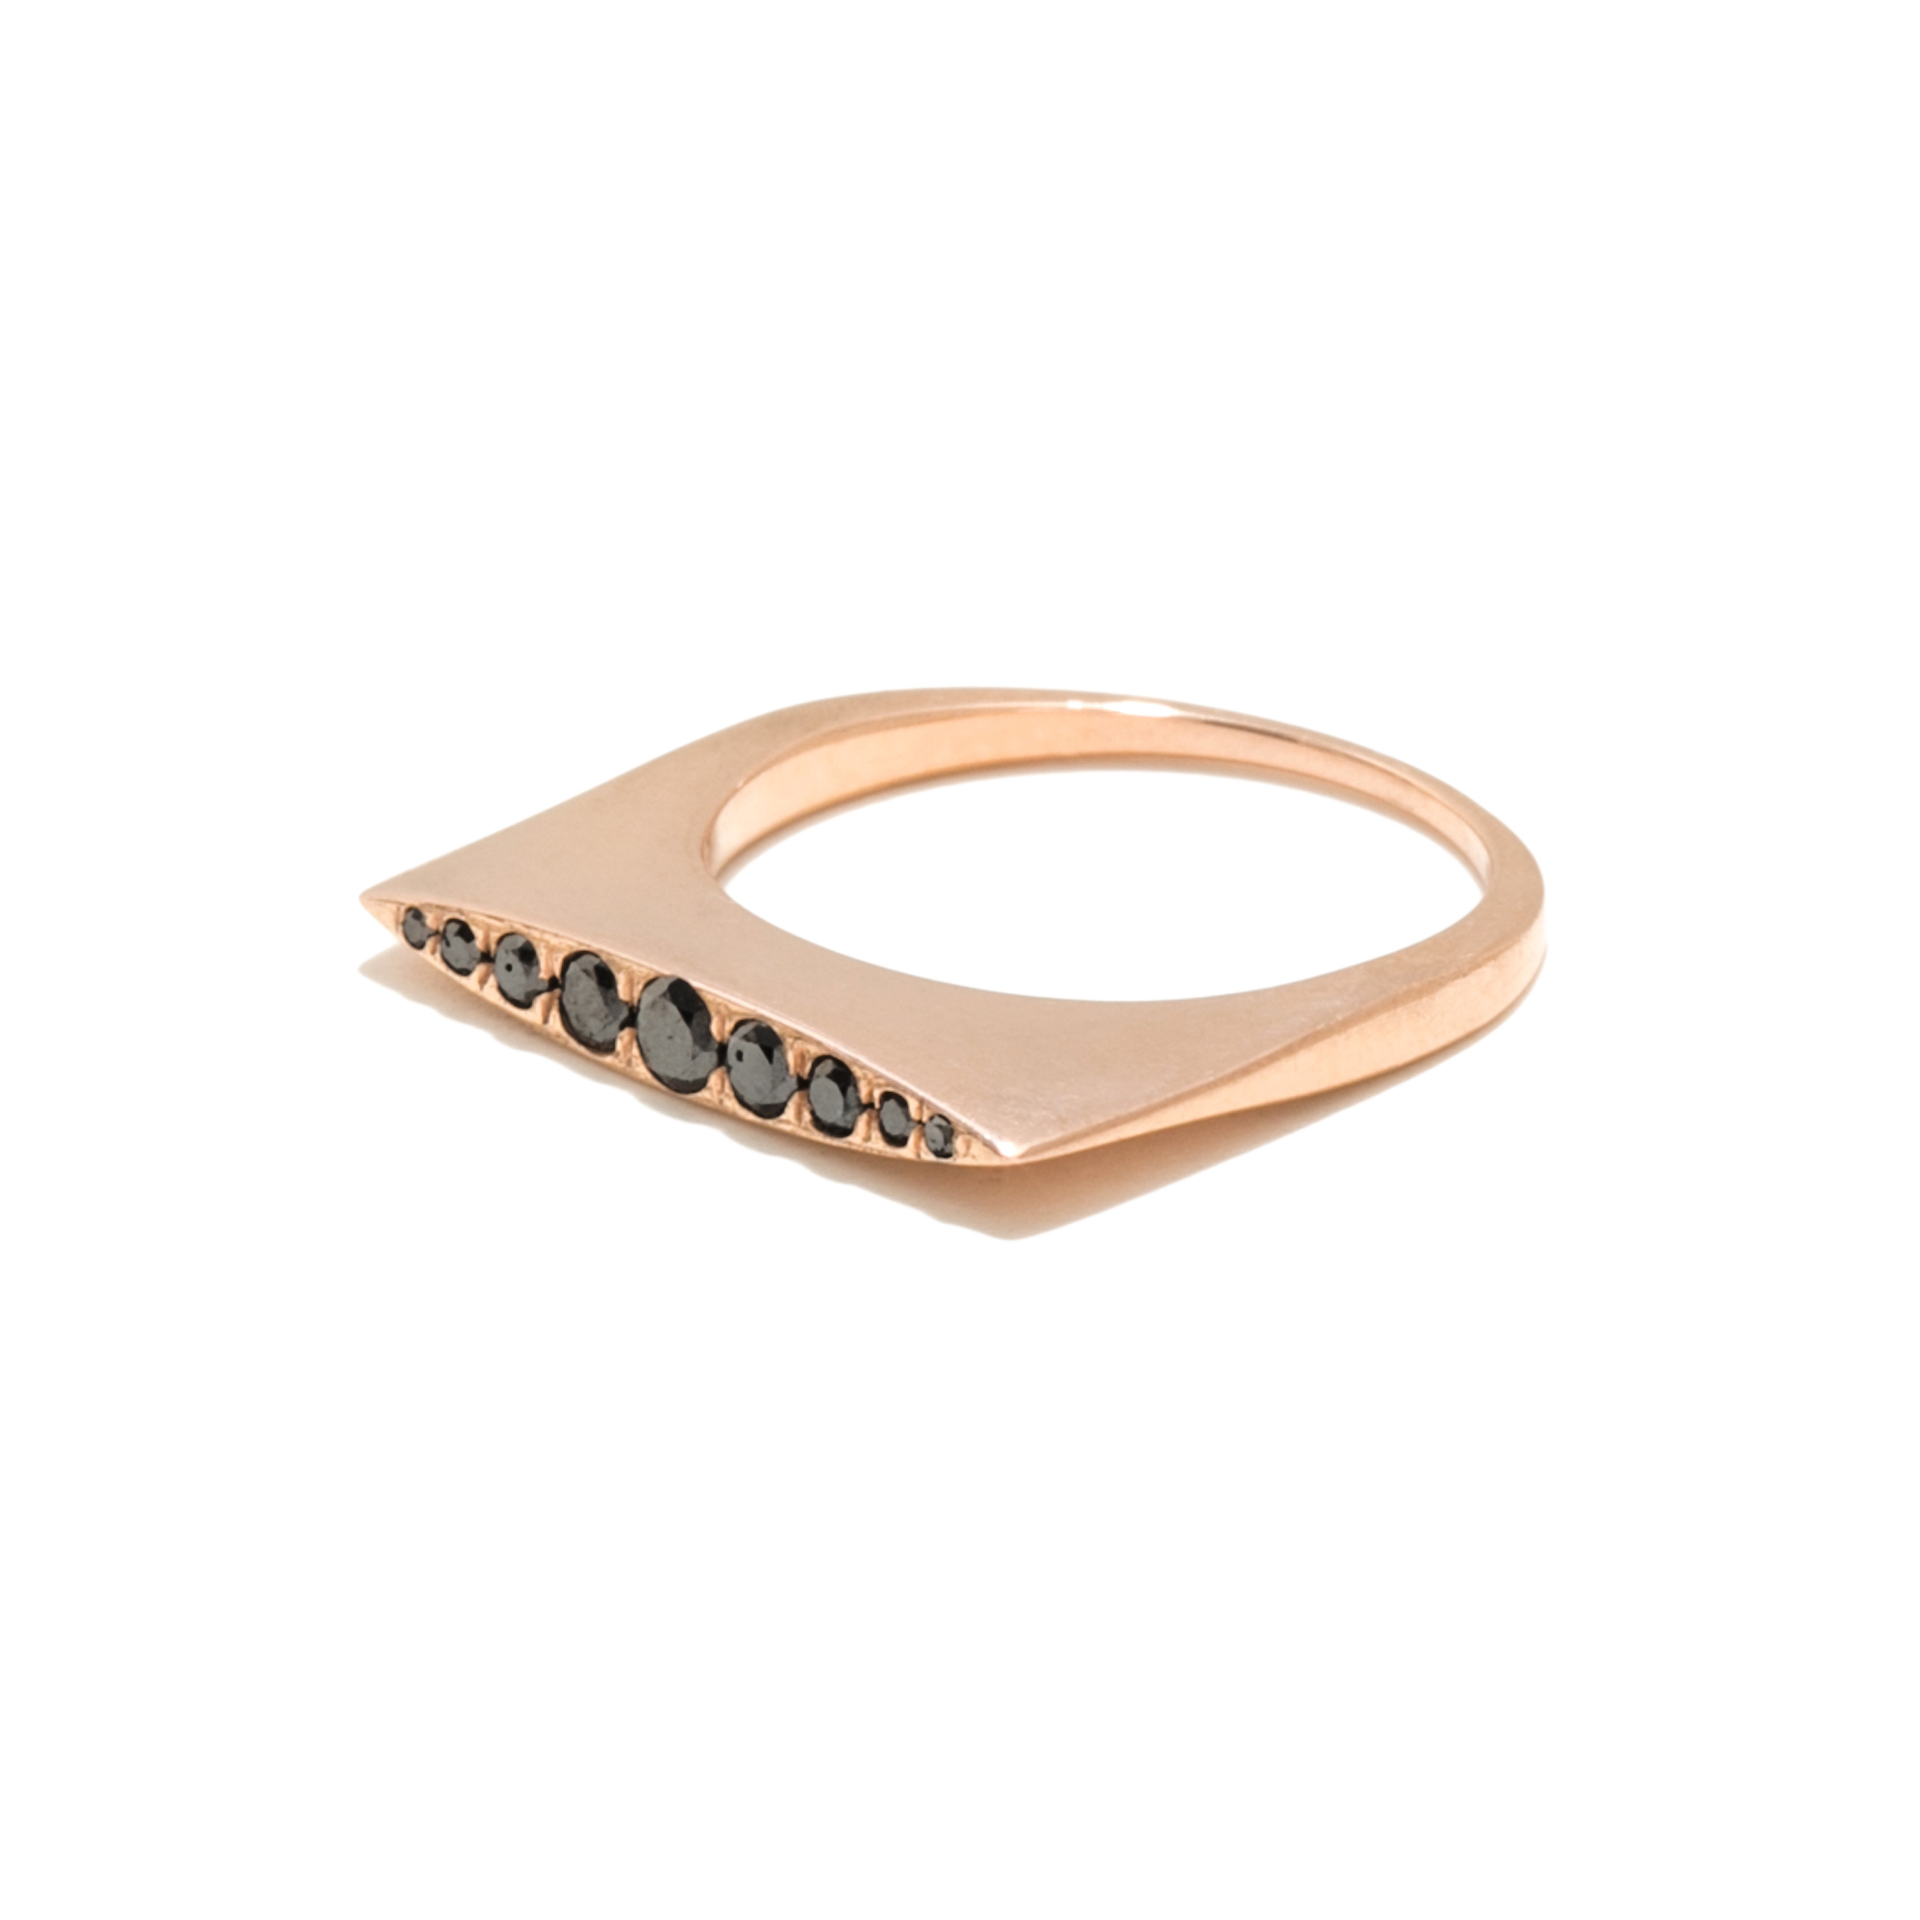 Convex_Ring_Rose_Gold_Black_DiamondsA.jpg